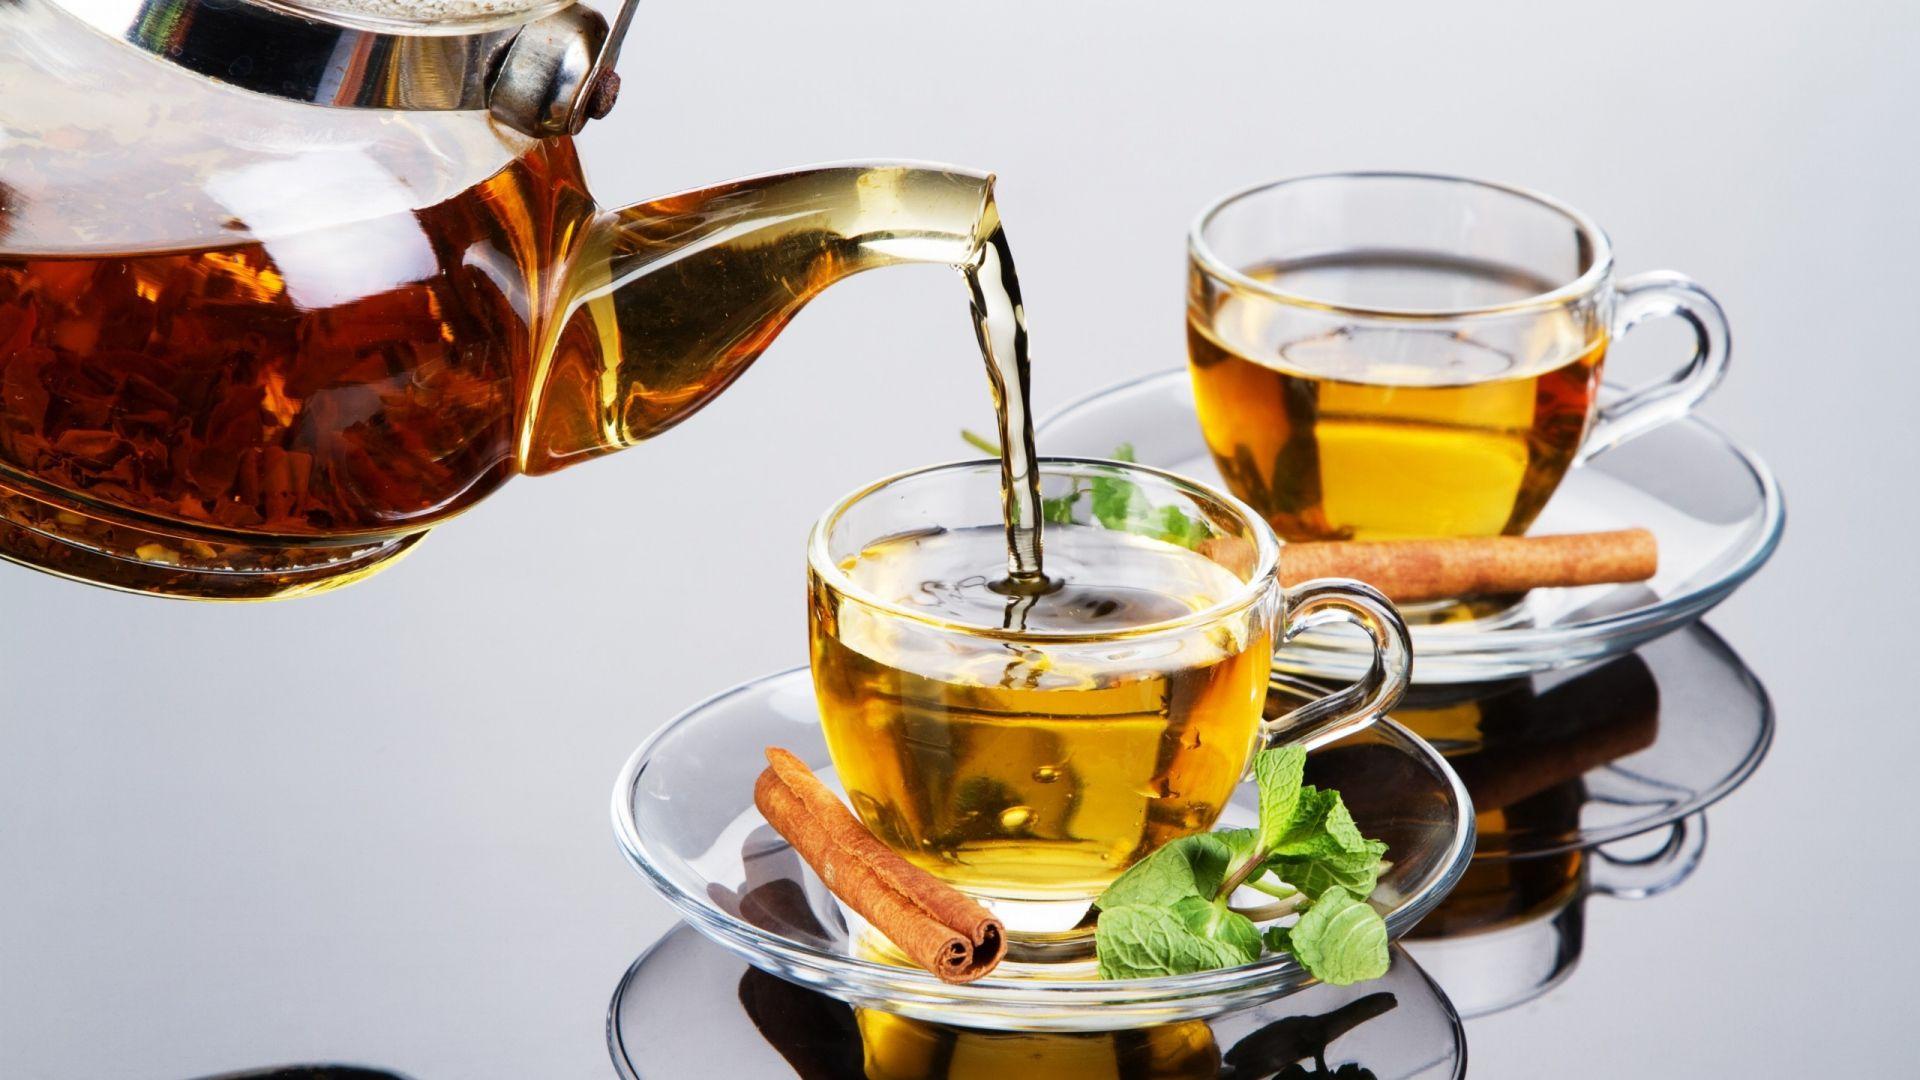 Download Wallpaper 1920x1080 Tea Cinnamon Mint Drink Full Hd 1080p Hd Background Tea Wallpaper Green Tea Recipes Mint Drink